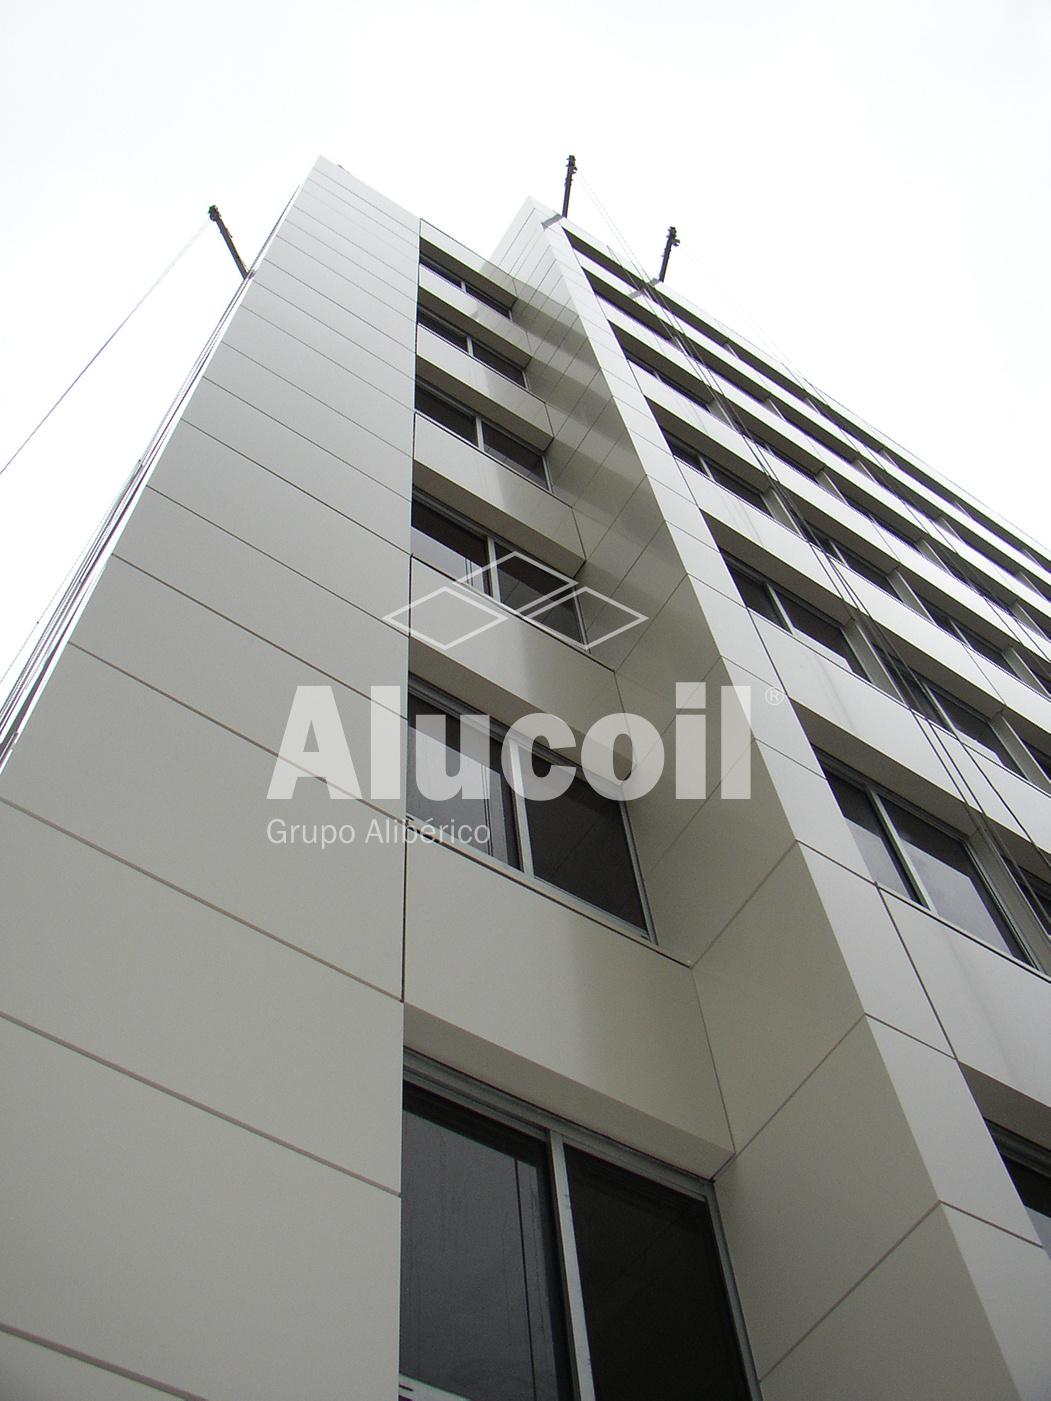 Offices building Rueil Malmaison